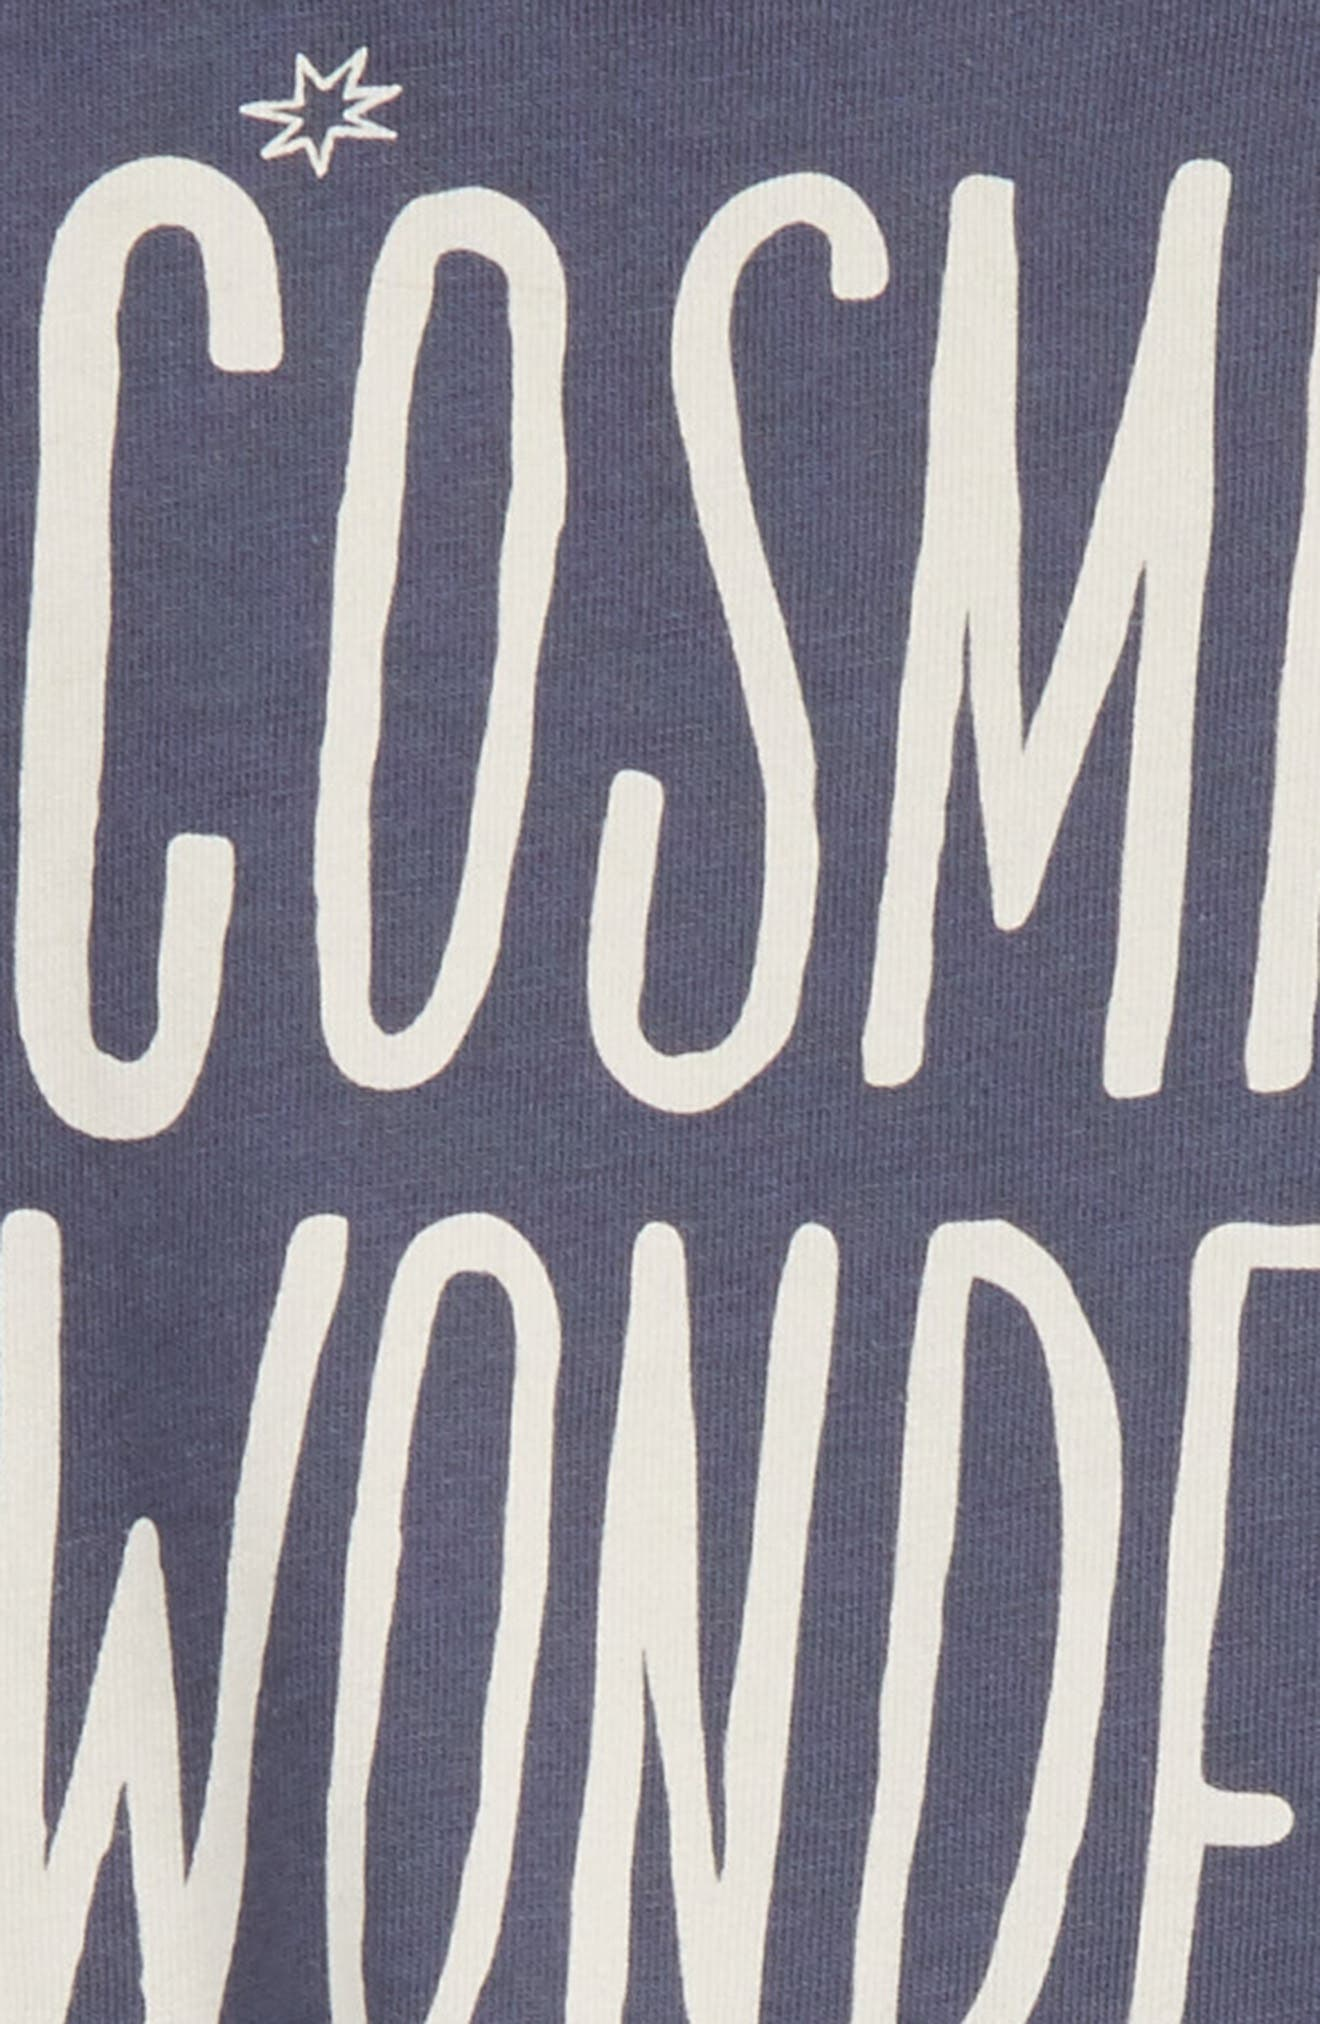 Peek Cosmic Wonder Graphic T-Shirt,                             Alternate thumbnail 2, color,                             410